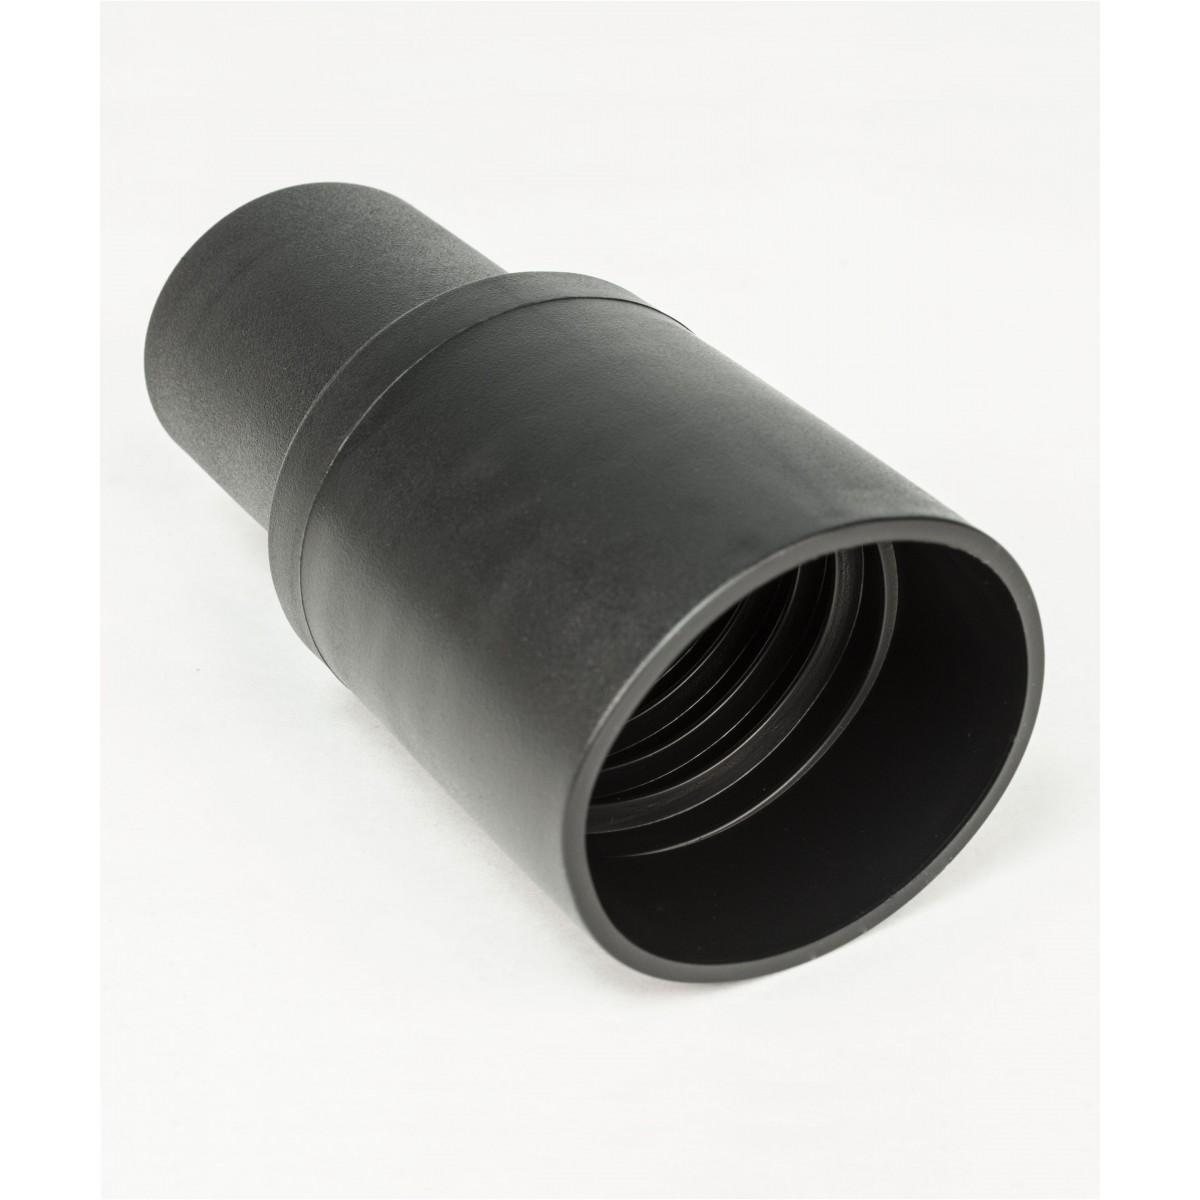 Hose End Cuff Swivel 1 1 4 Black